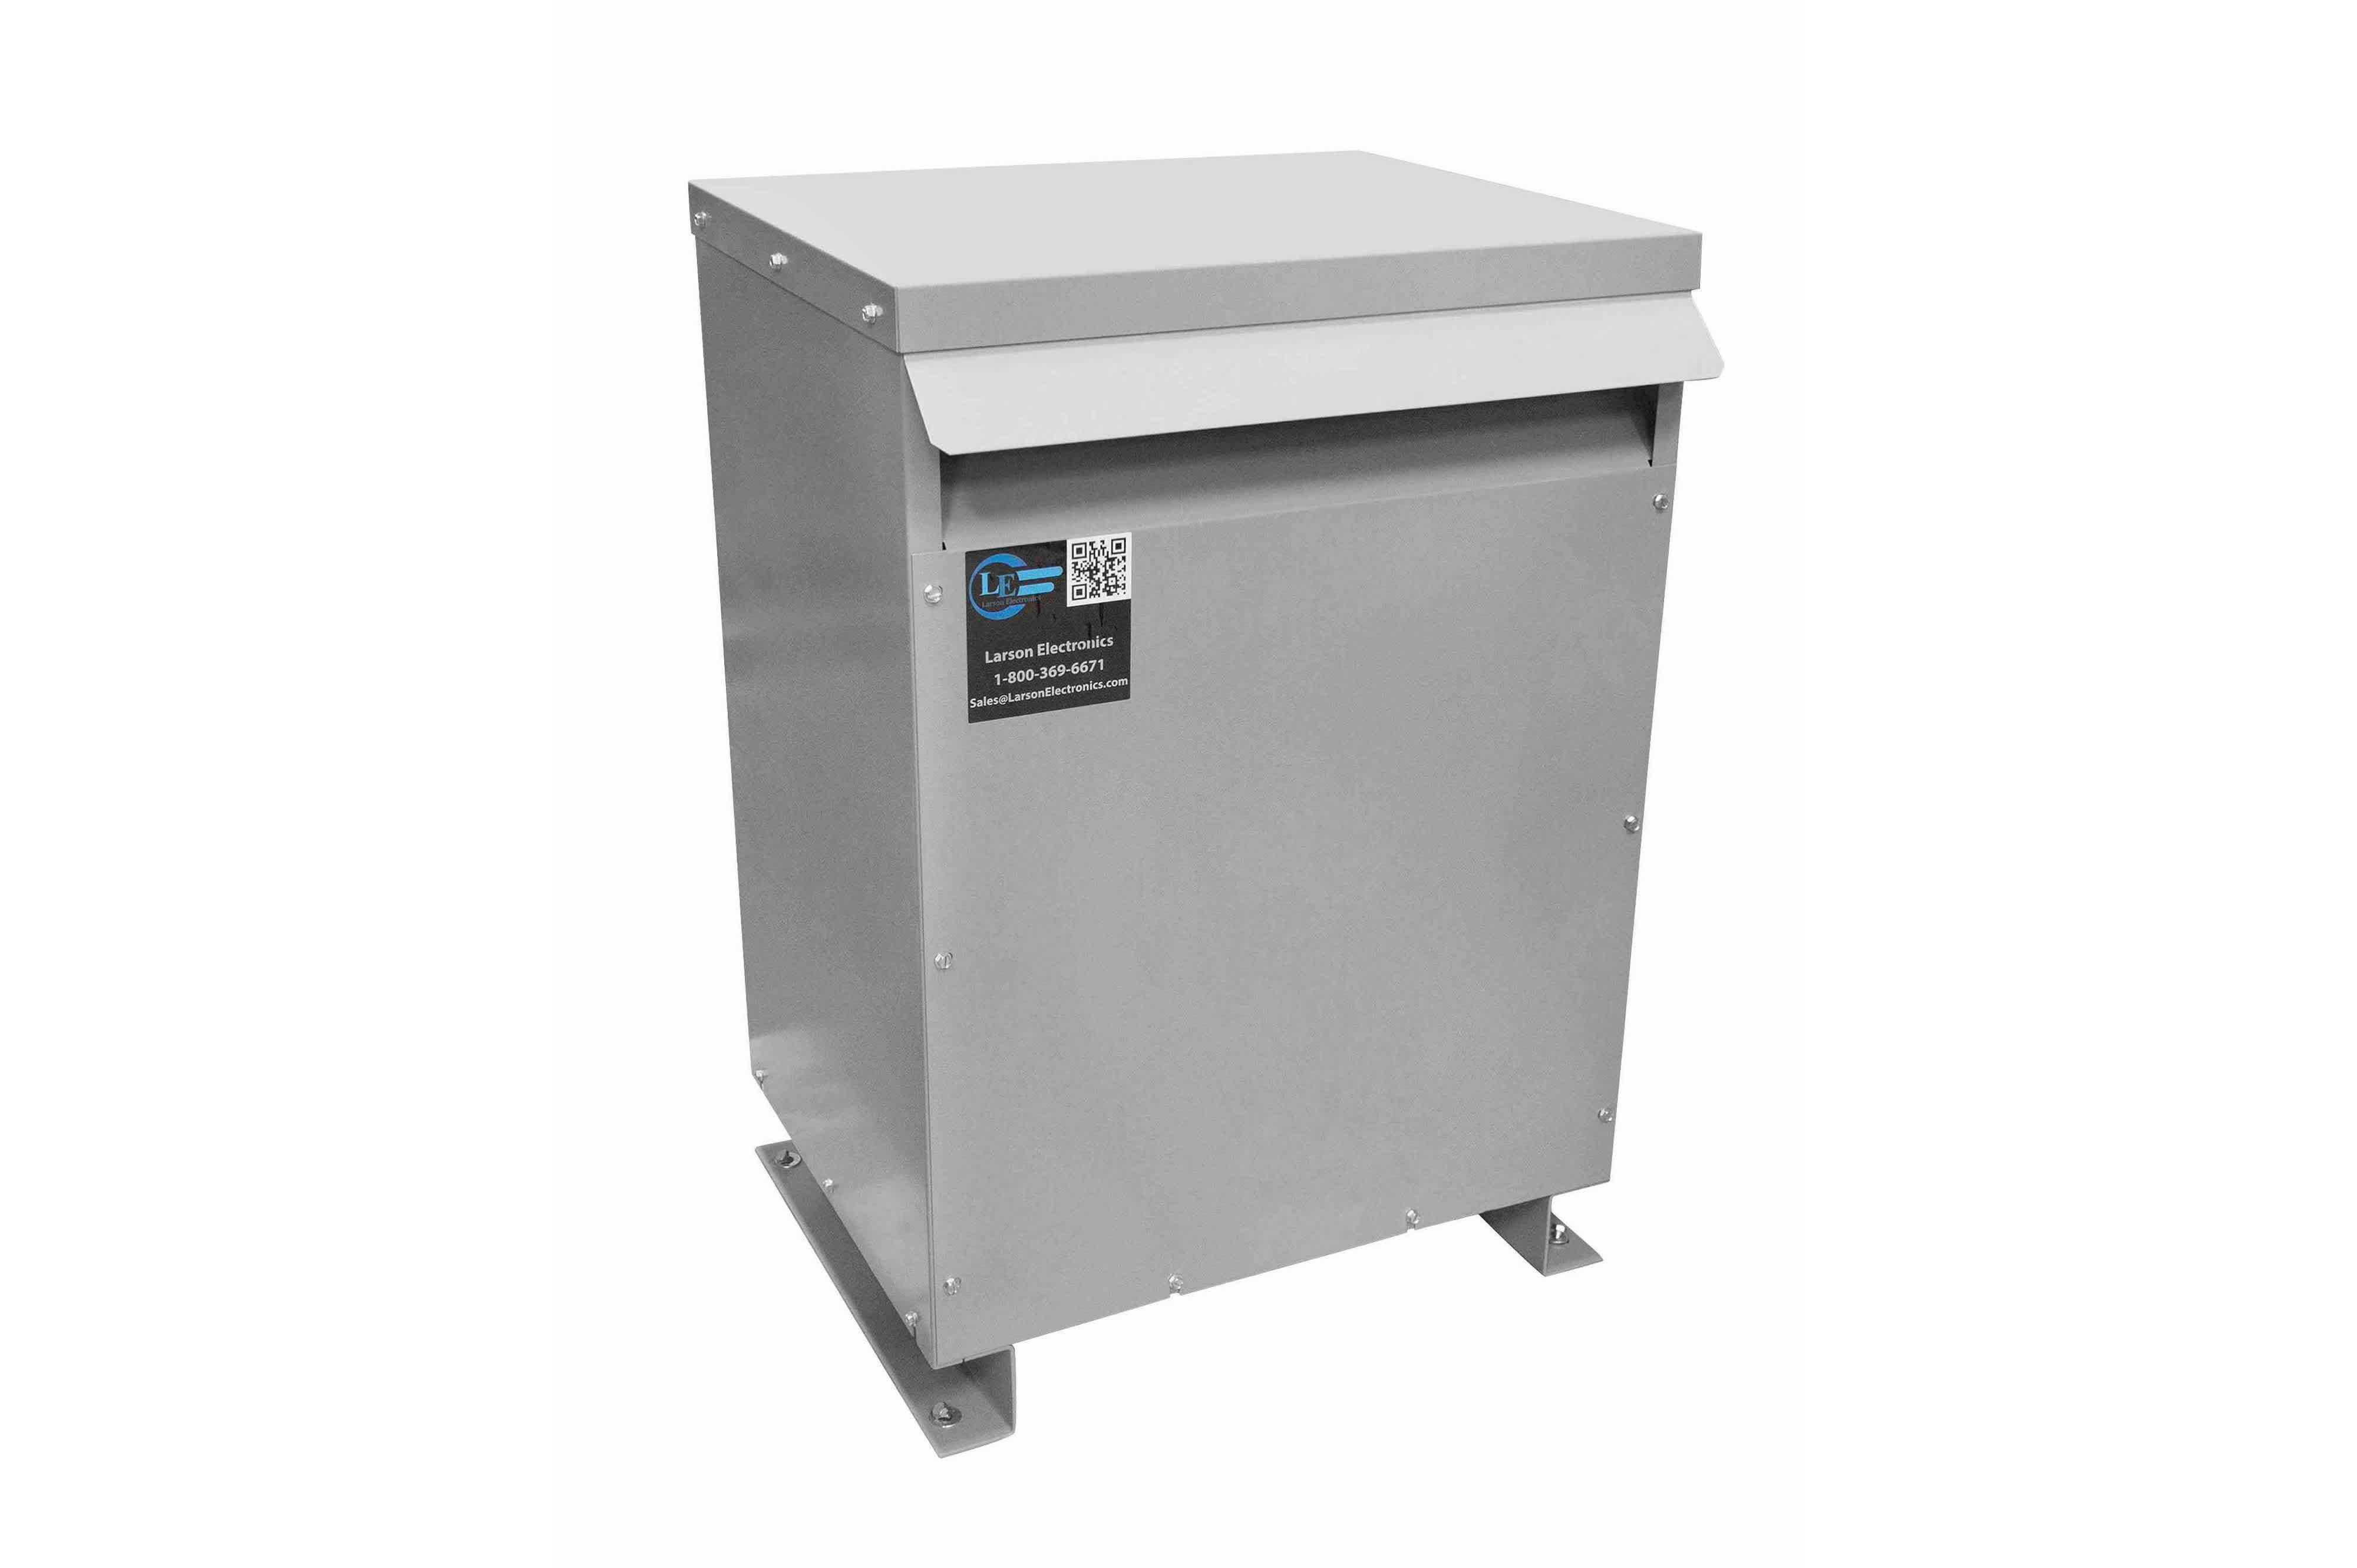 175 kVA 3PH Isolation Transformer, 240V Wye Primary, 415V Delta Secondary, N3R, Ventilated, 60 Hz